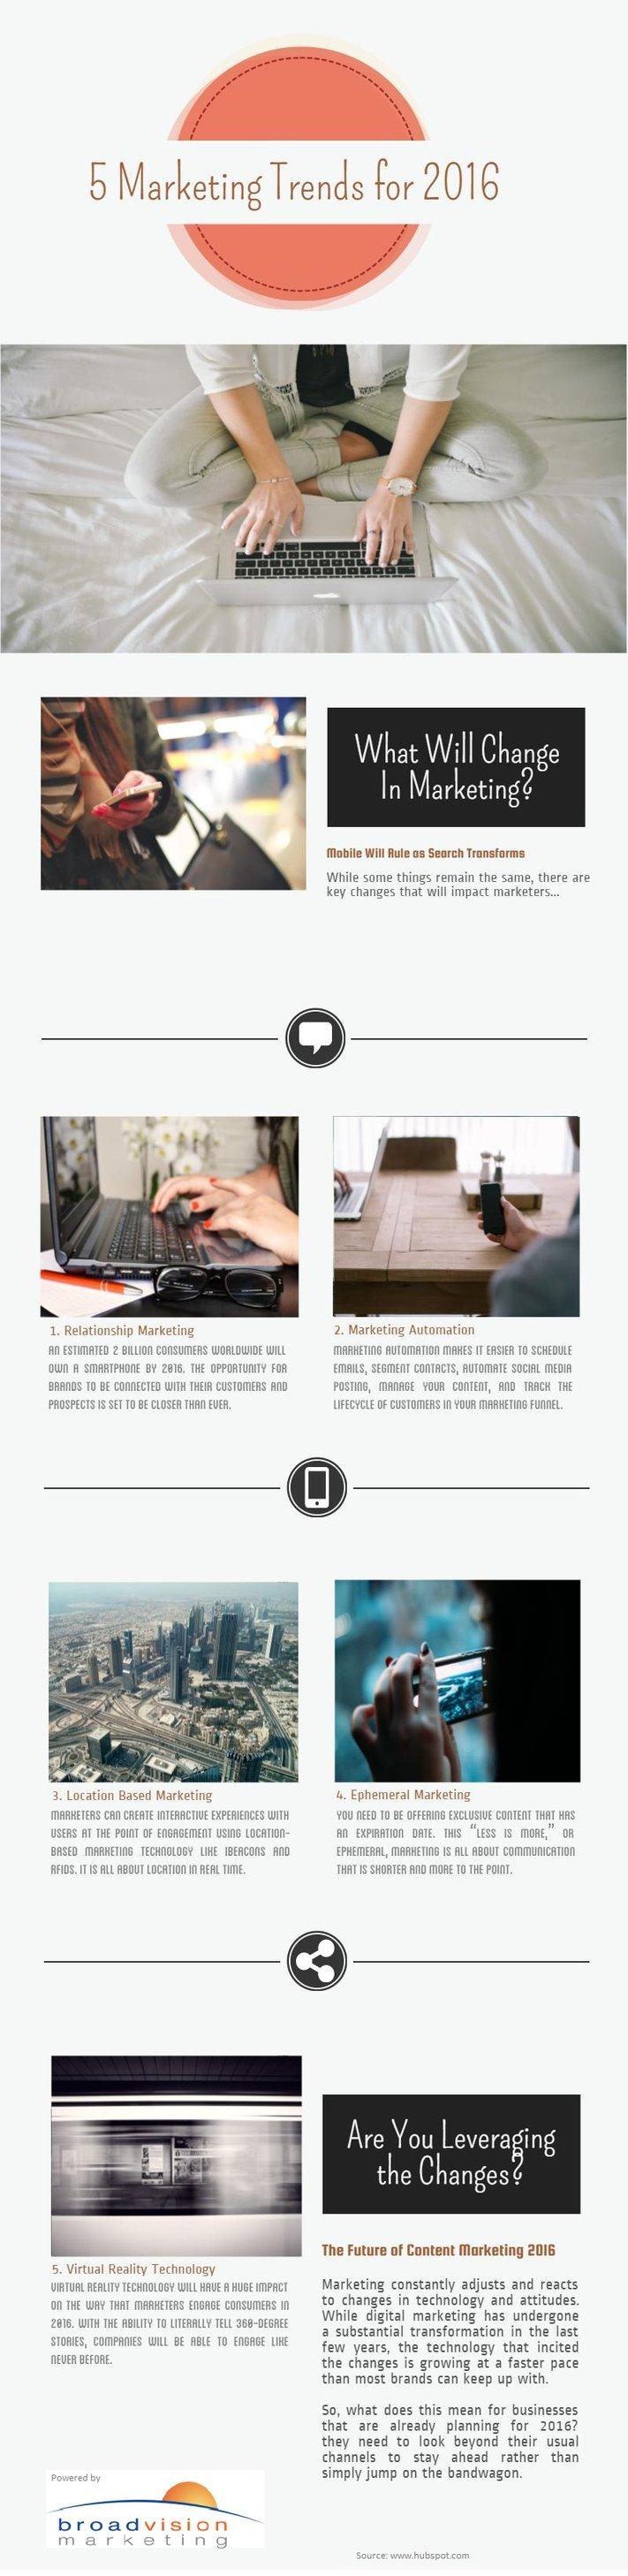 5-marketing-trends-in-2016.jpg